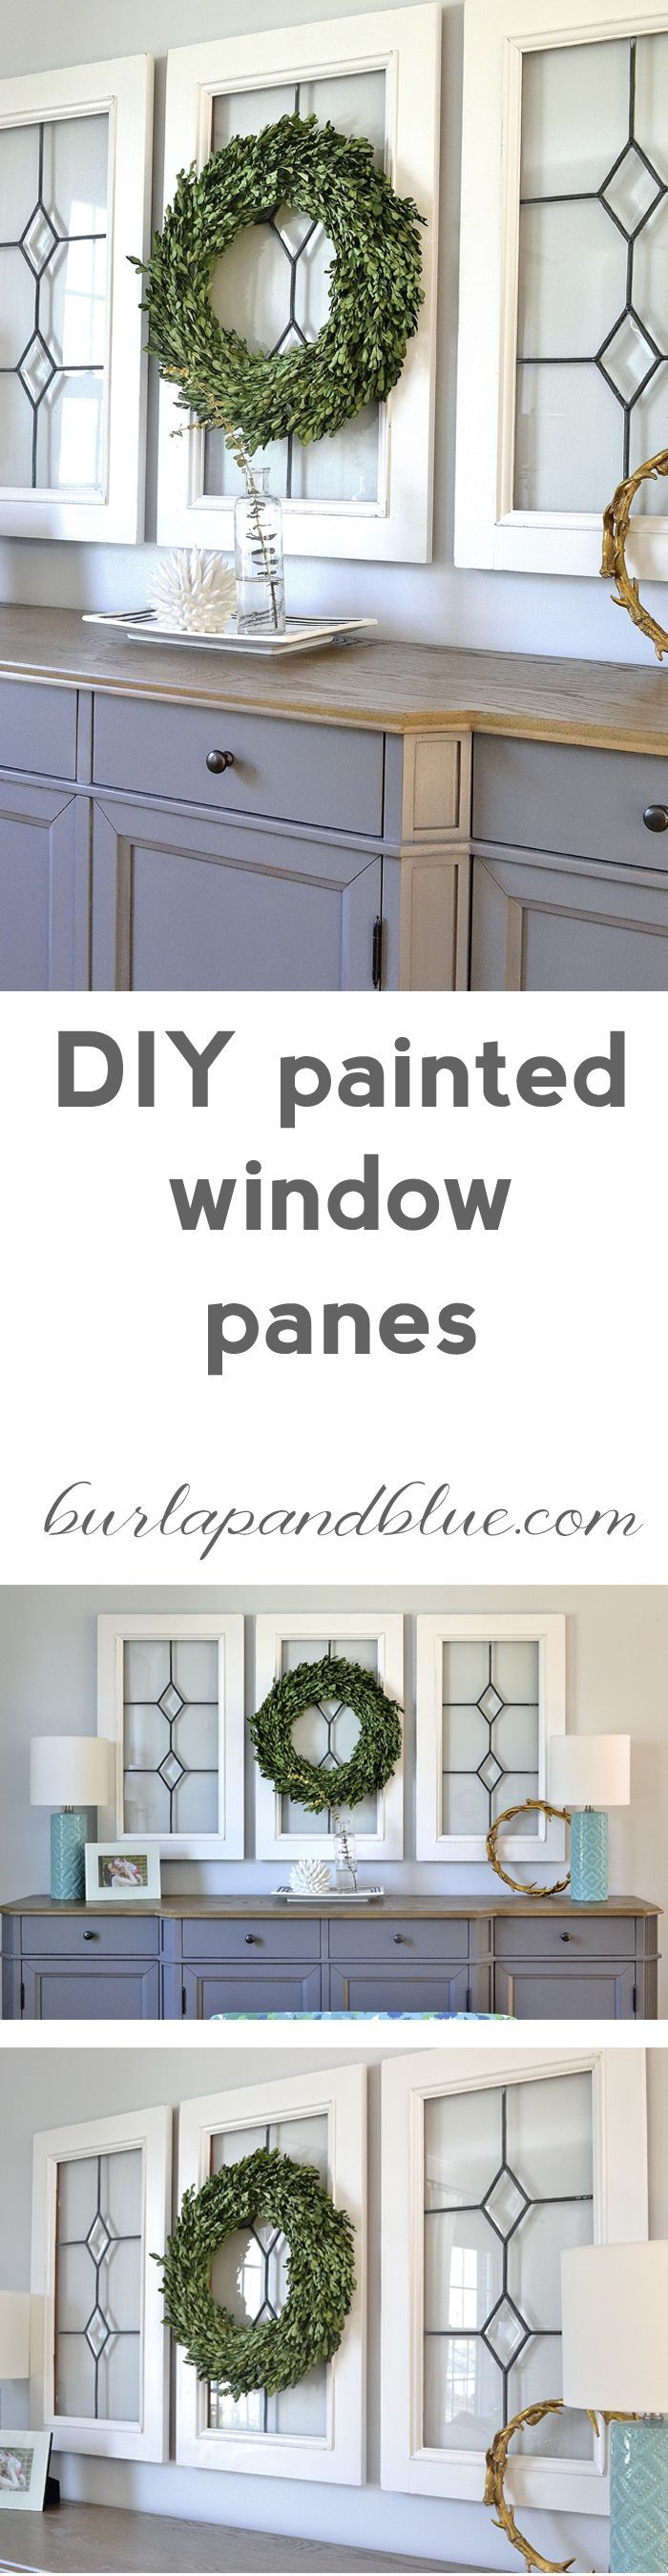 Diy vintage inspired window panes  tutorial also best decor images on pinterest rh